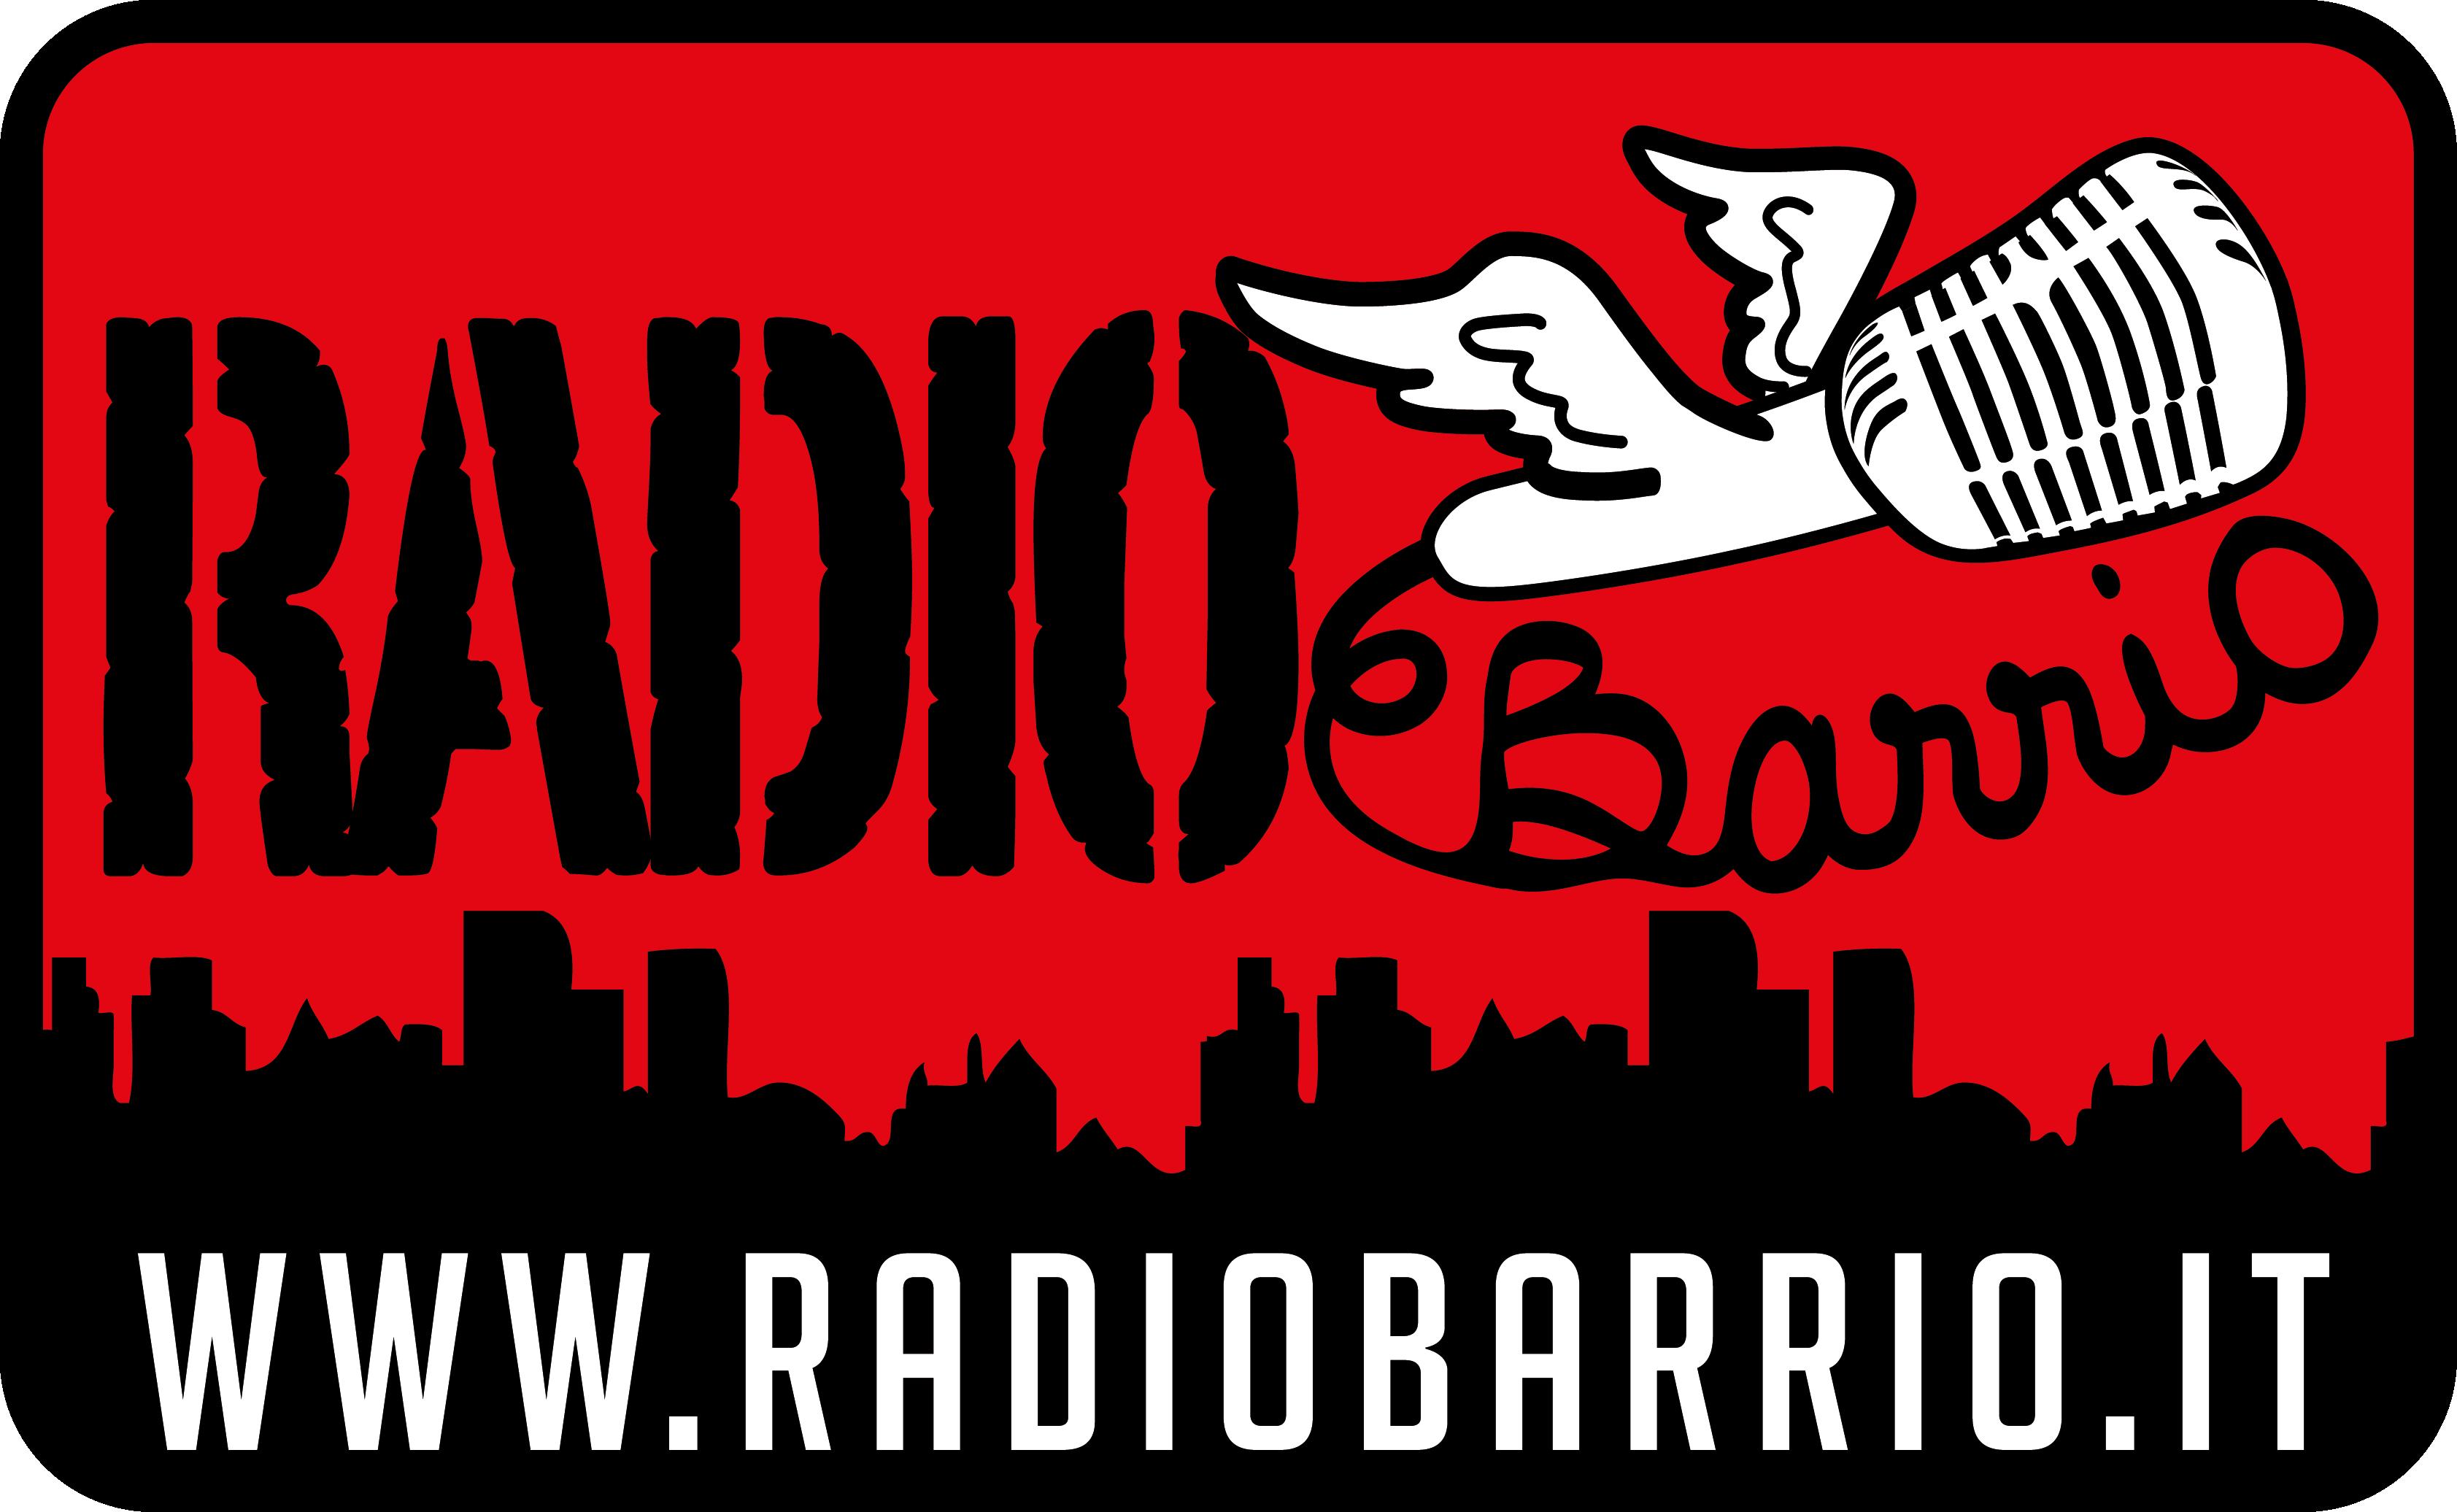 Radio Barrio